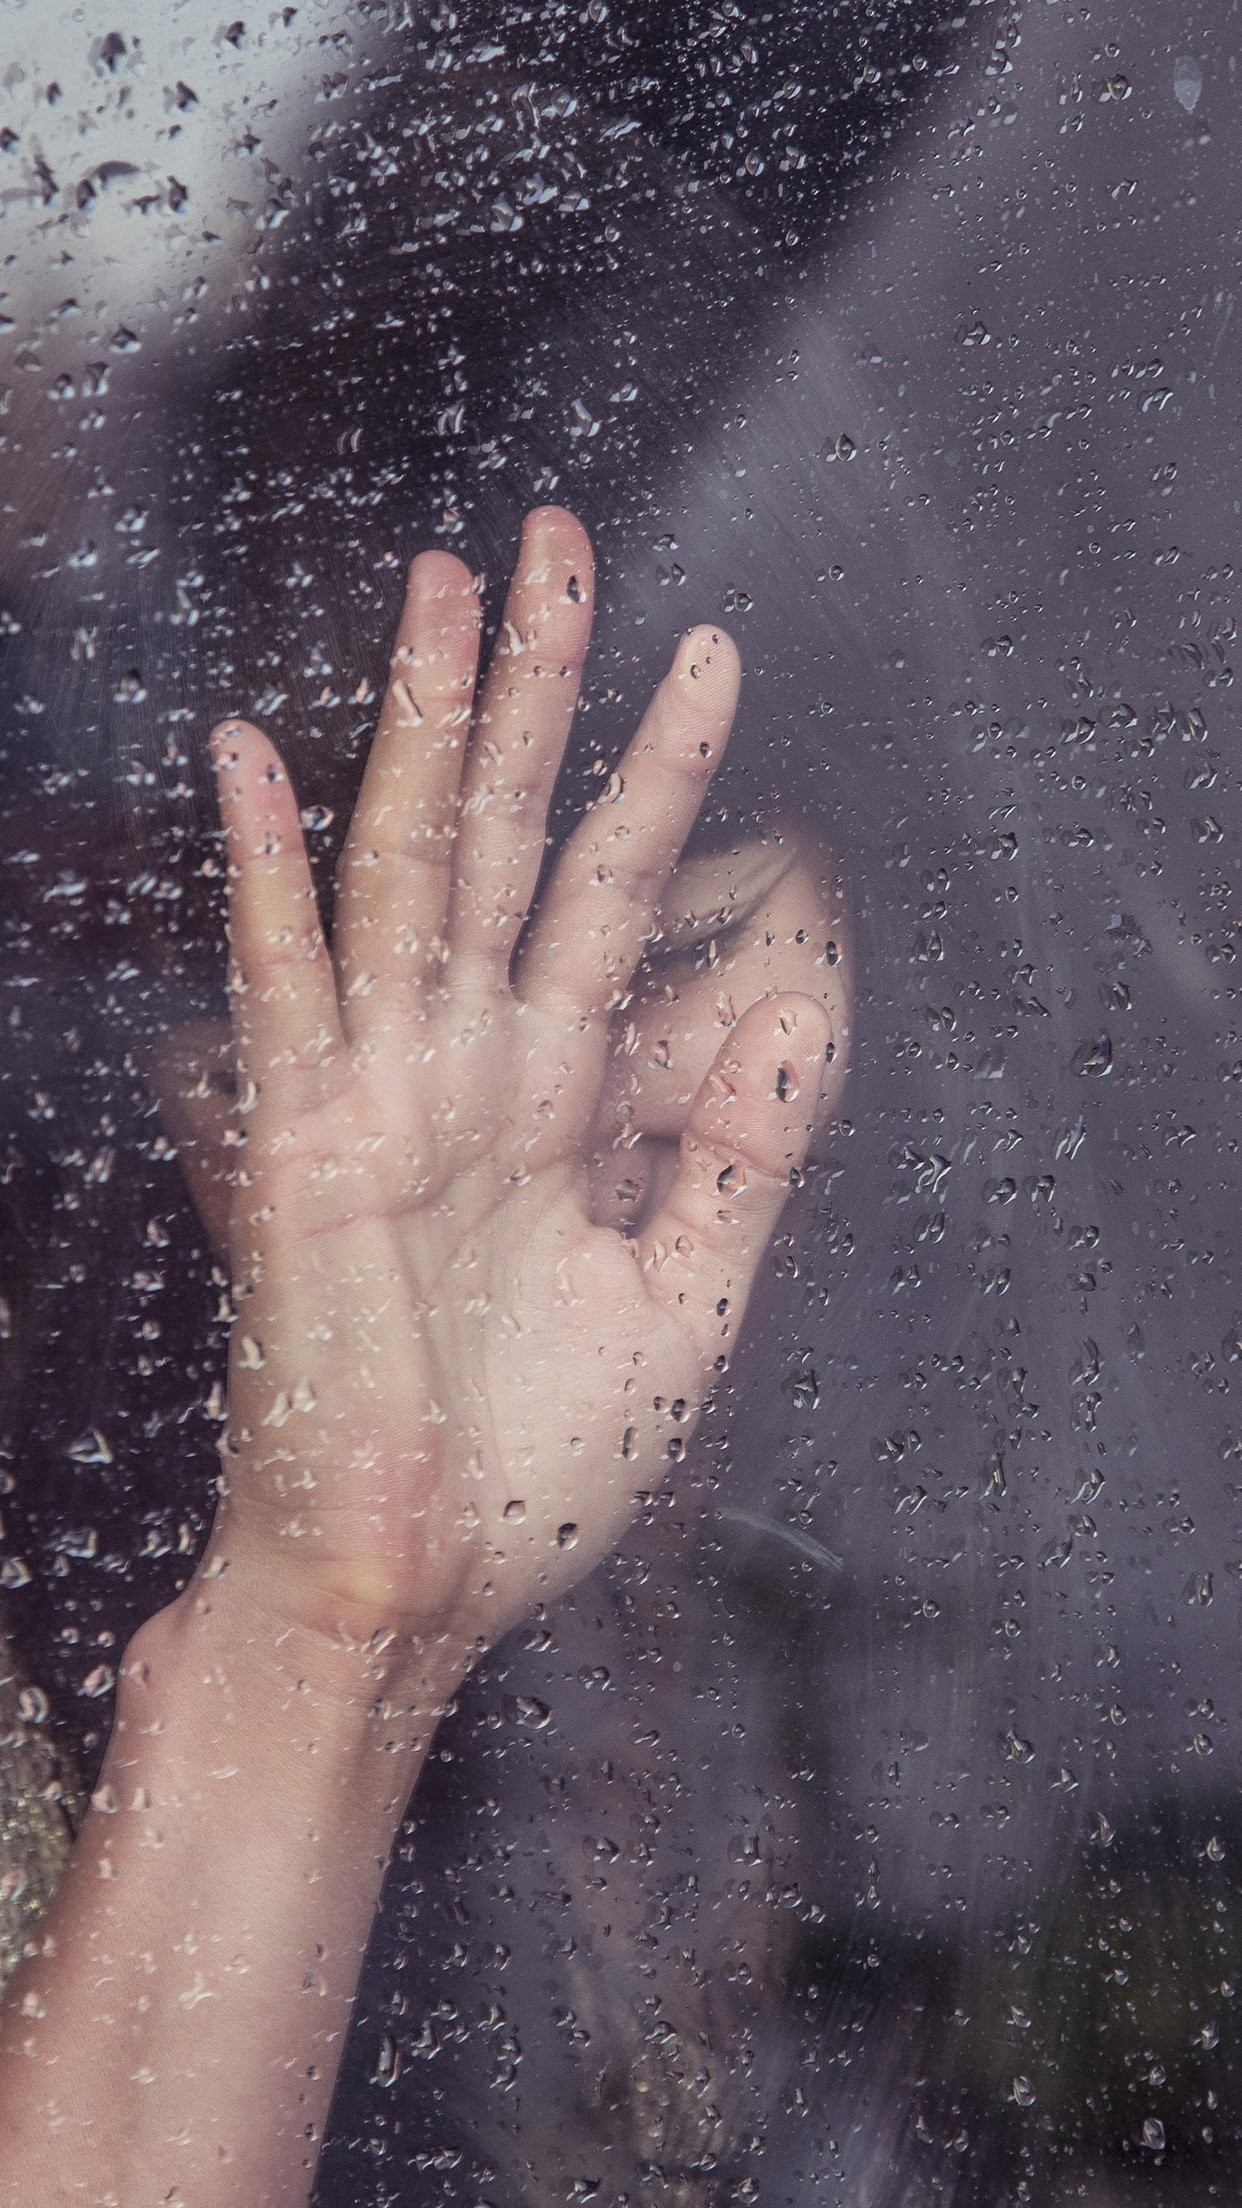 … rain girl shy asian nature iphone 7 wallpaper …